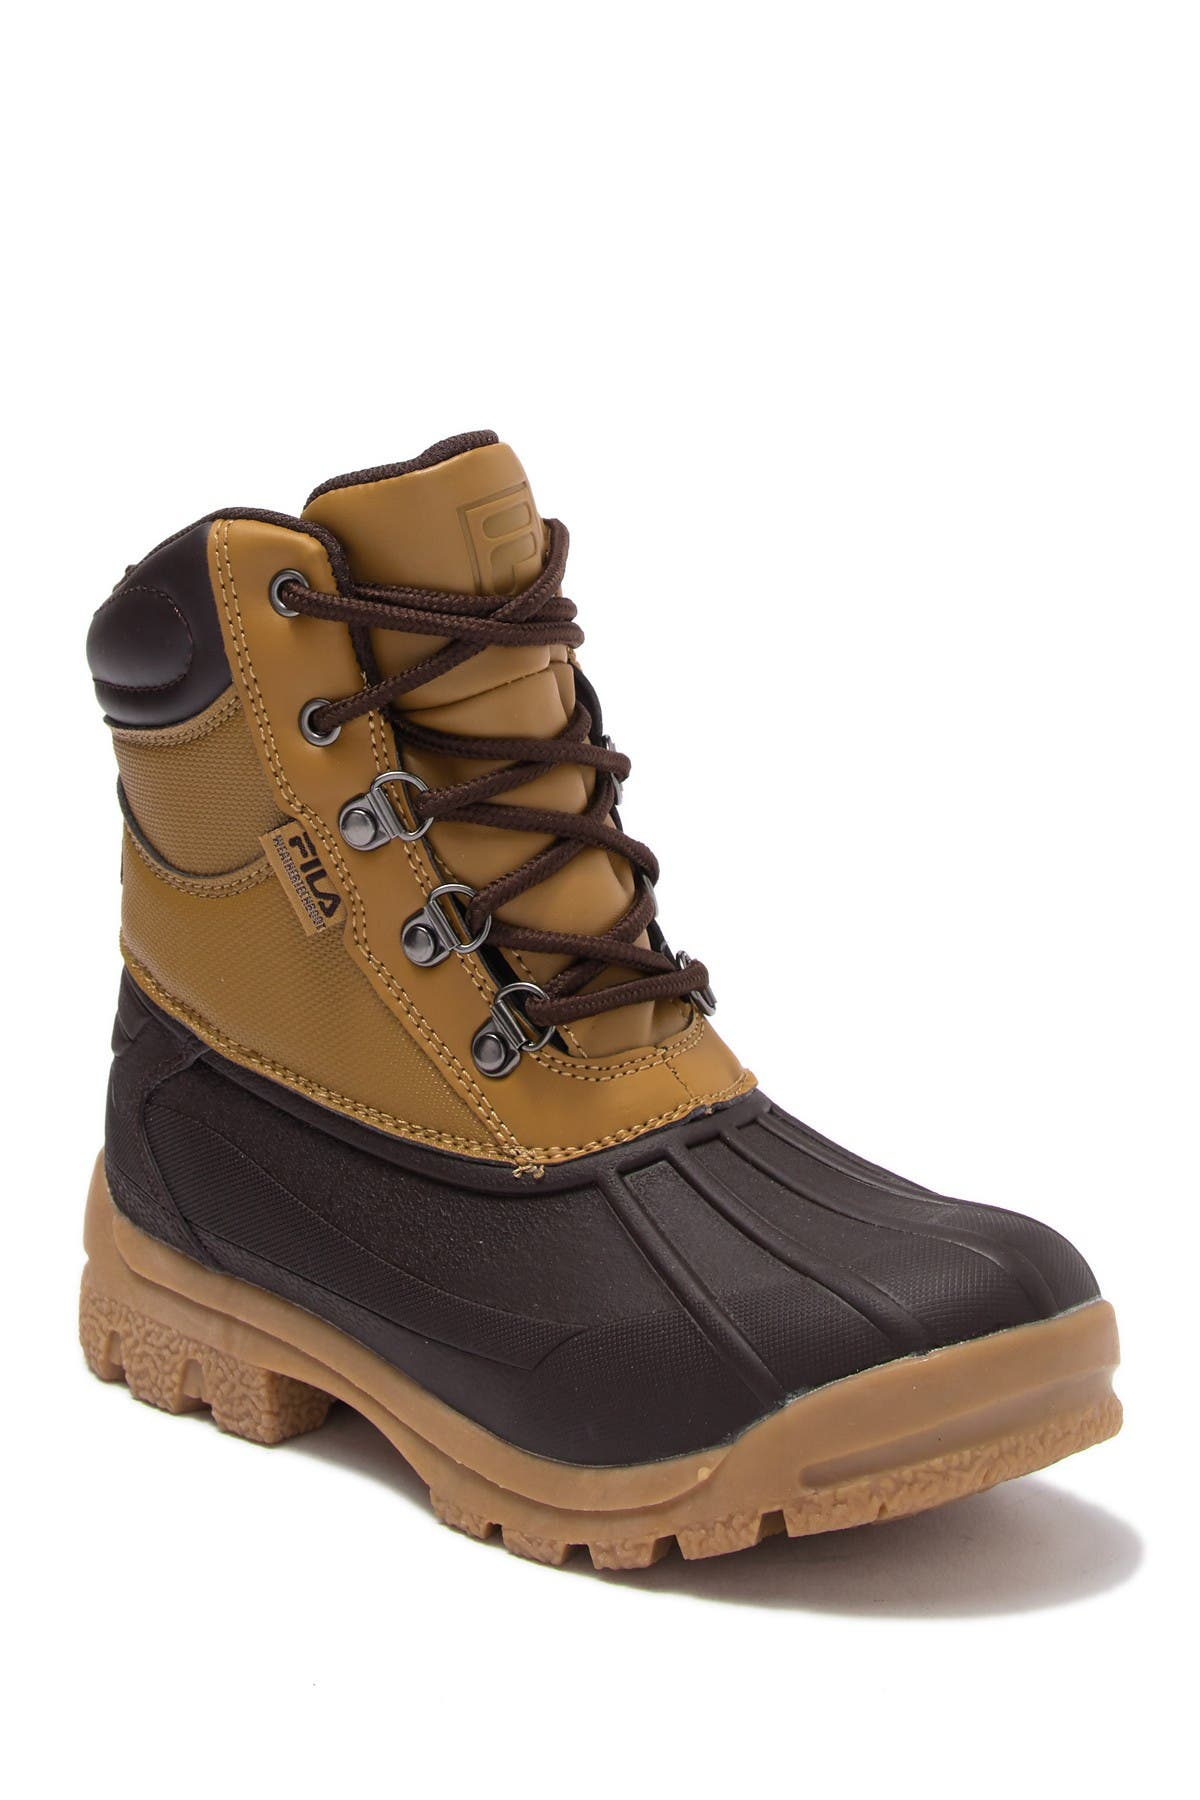 Image of FILA USA Weather Tech Extreme Boot